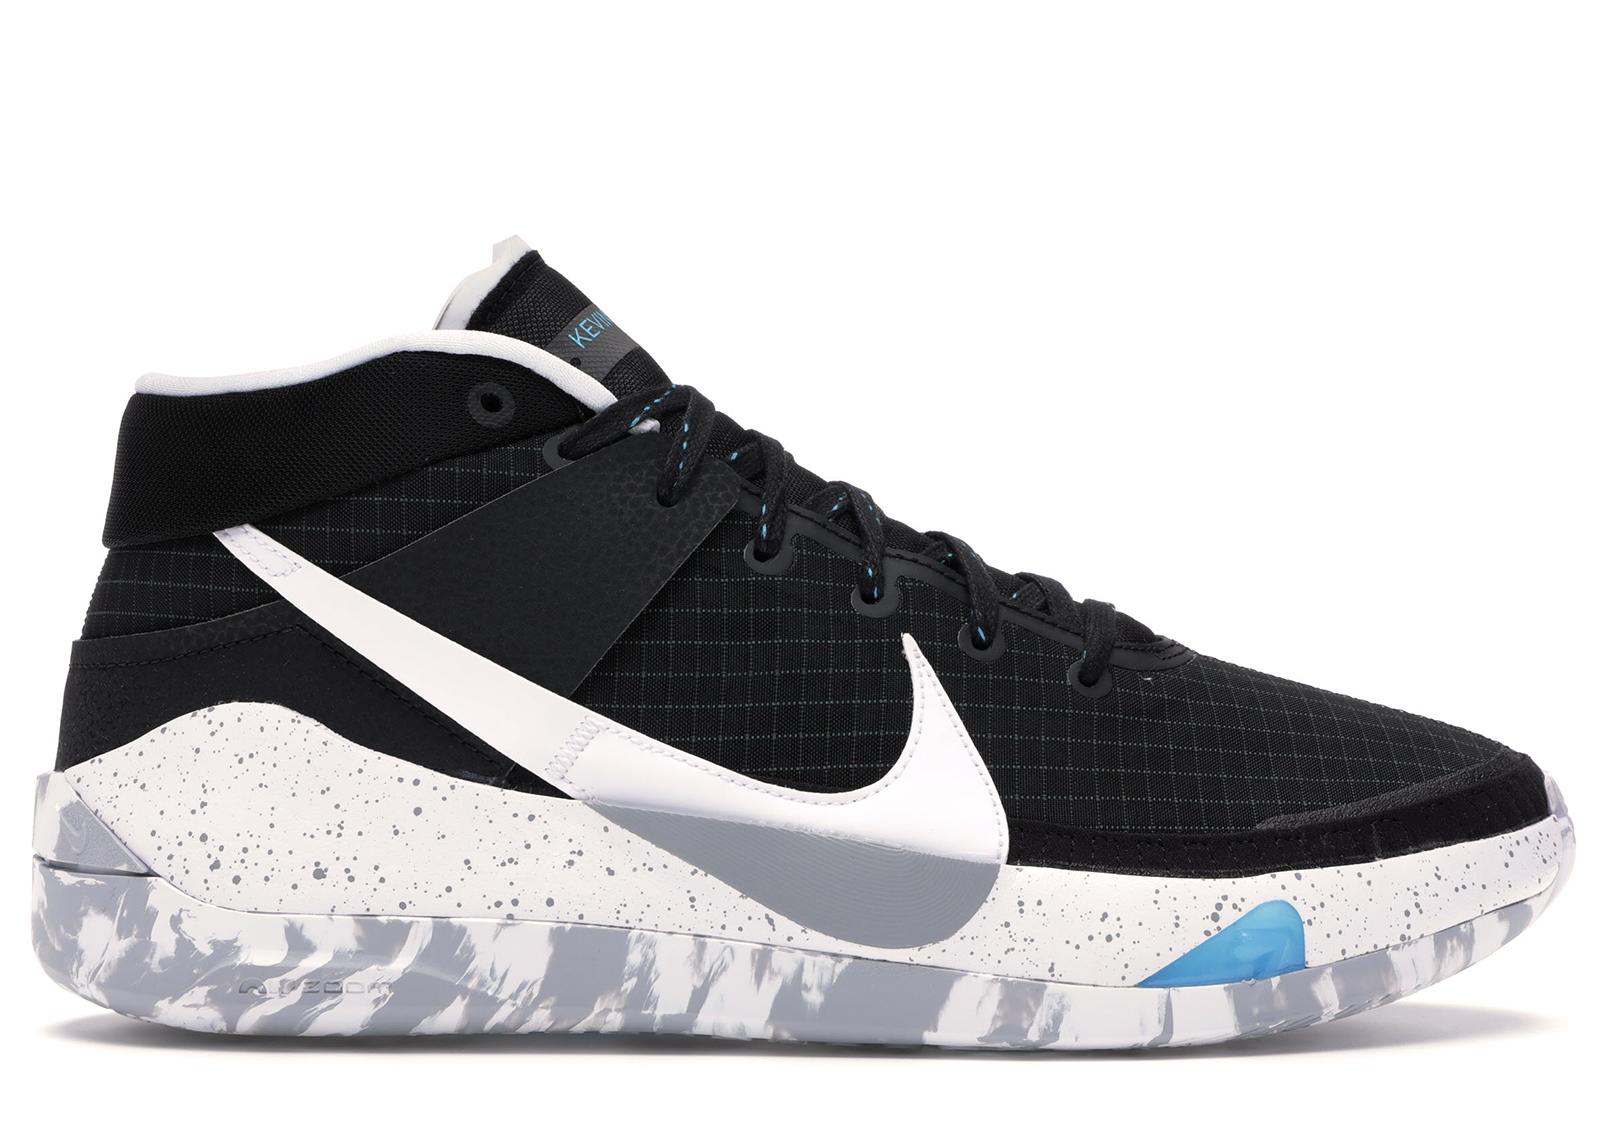 Nike KD 13 Black Grey - CI9948-001